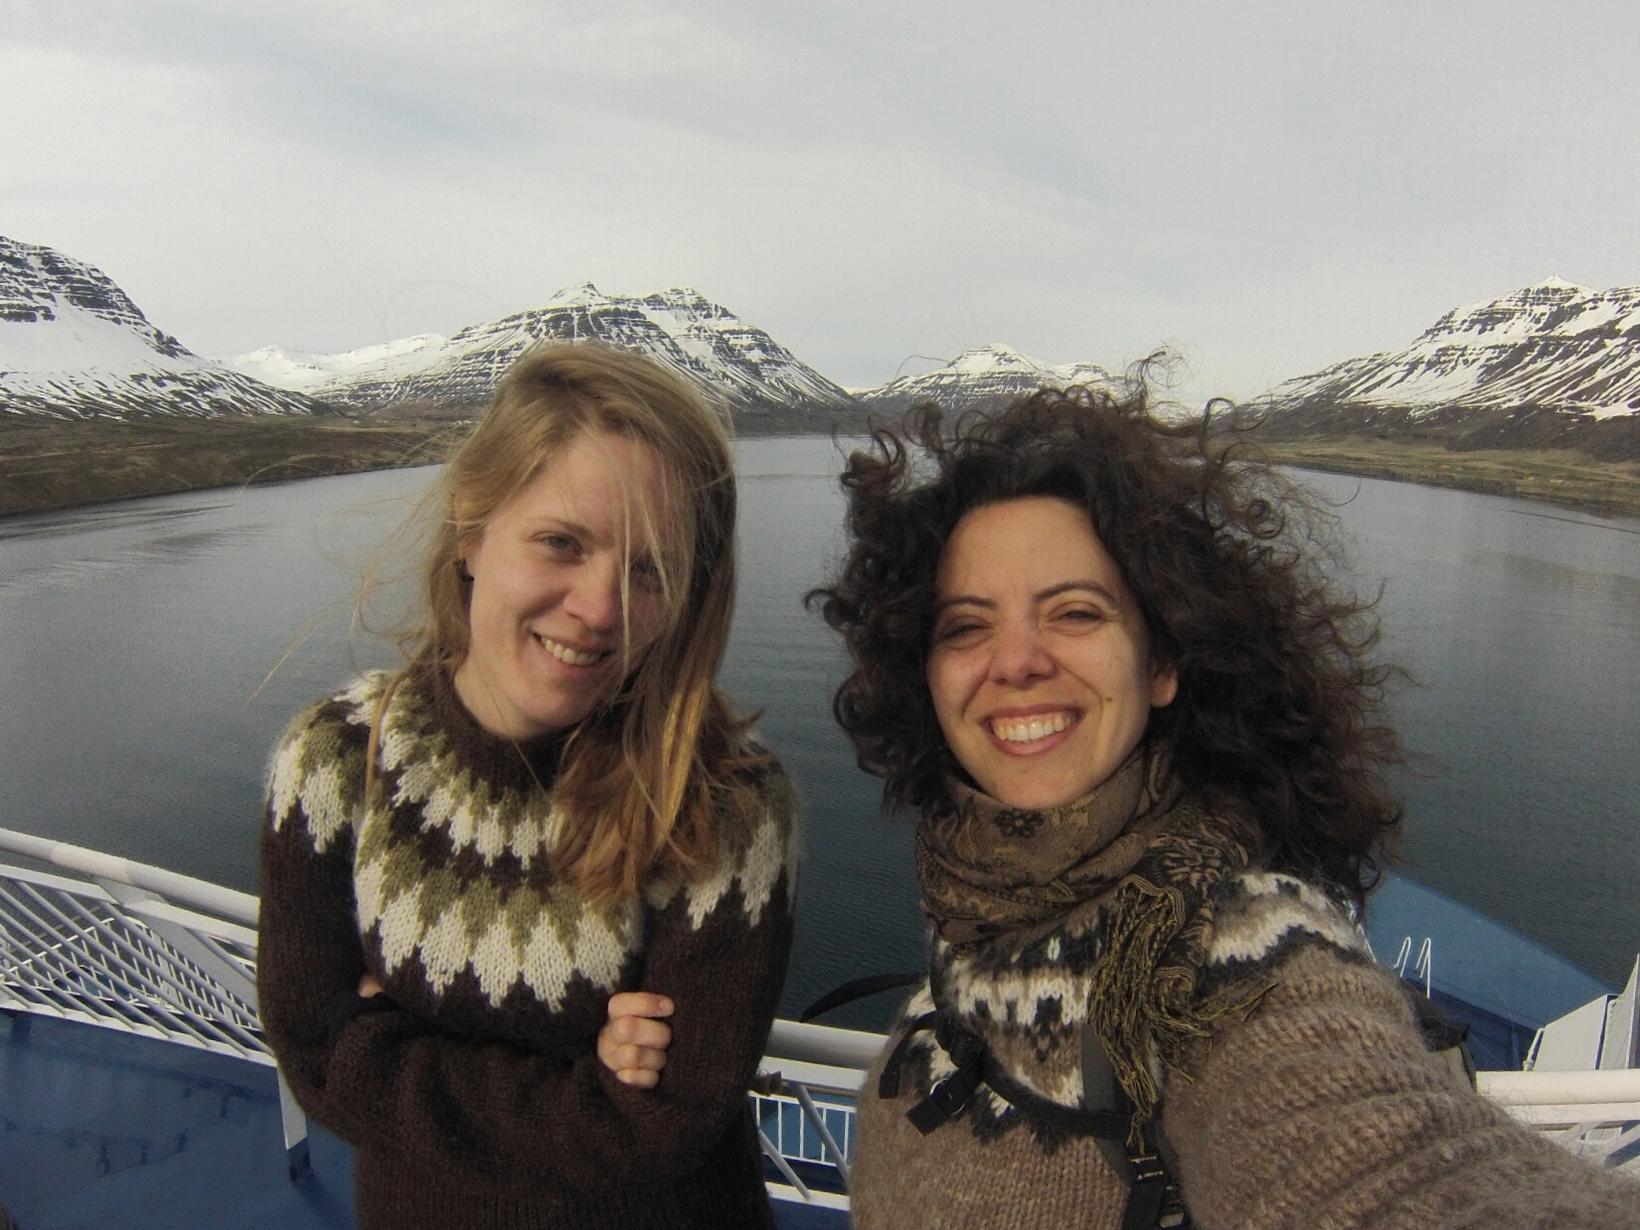 Nadine & Danielle from Hamburg, Germany